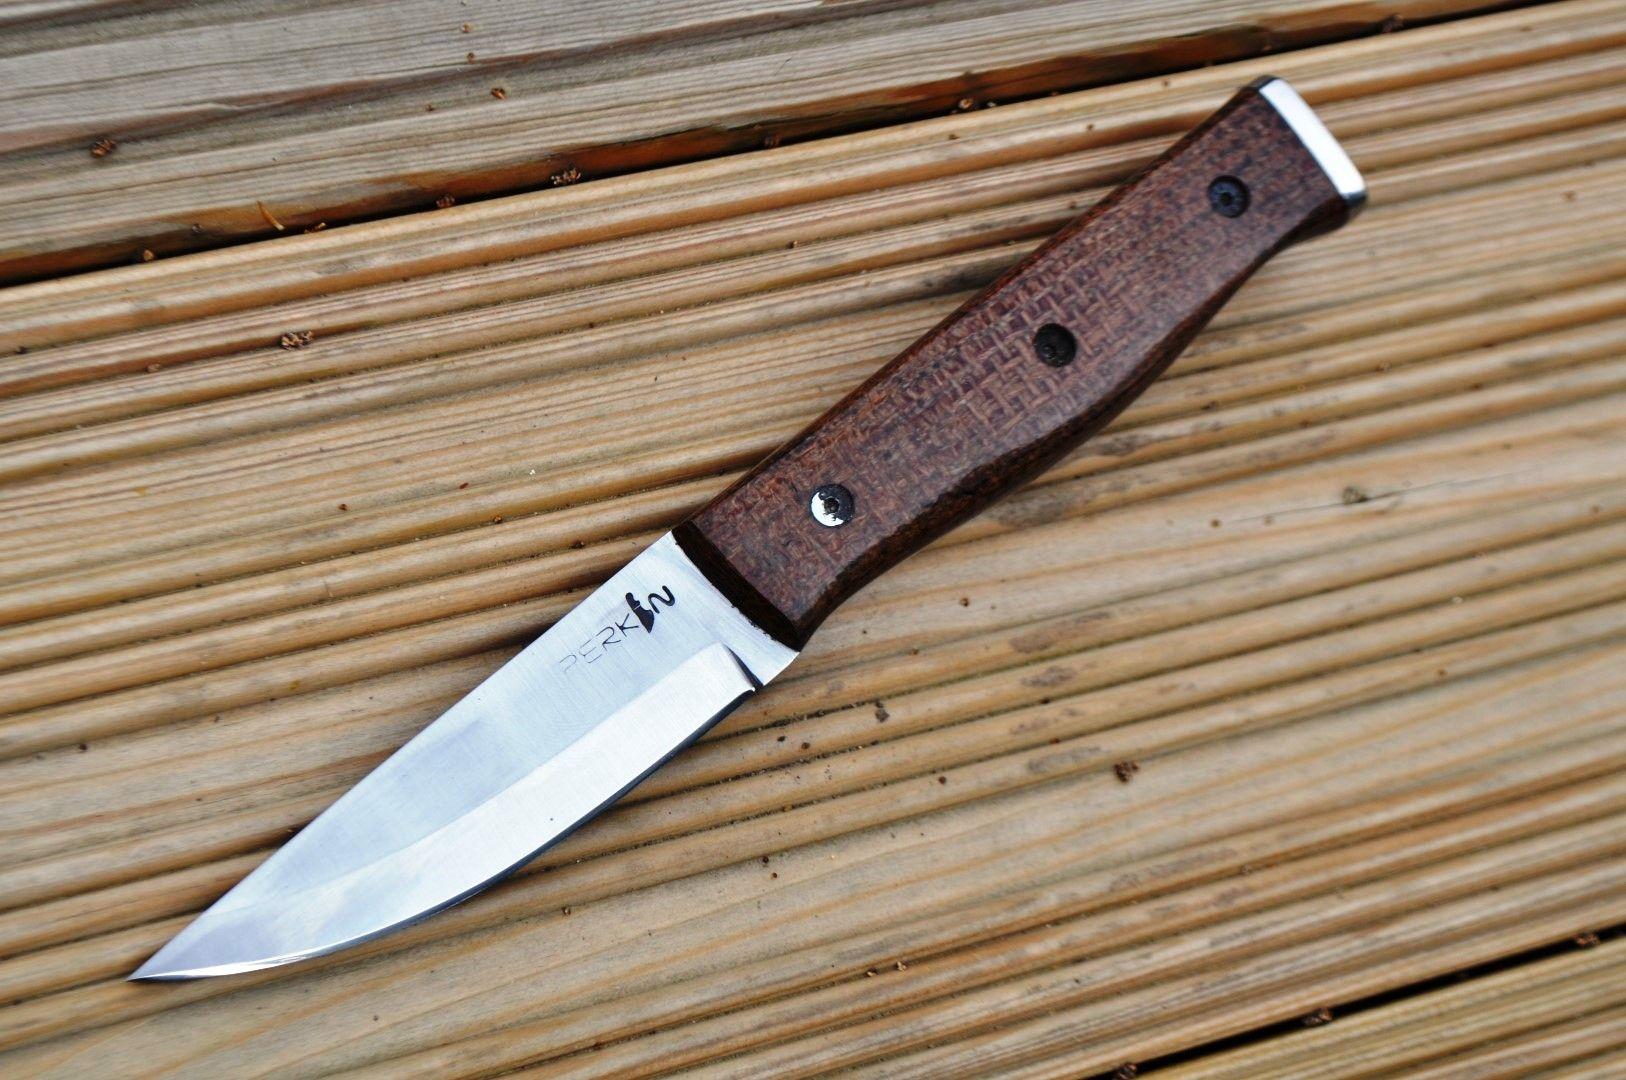 Custom Handmade Hunting/Bushcraft Knife with stunning Micarta Handle